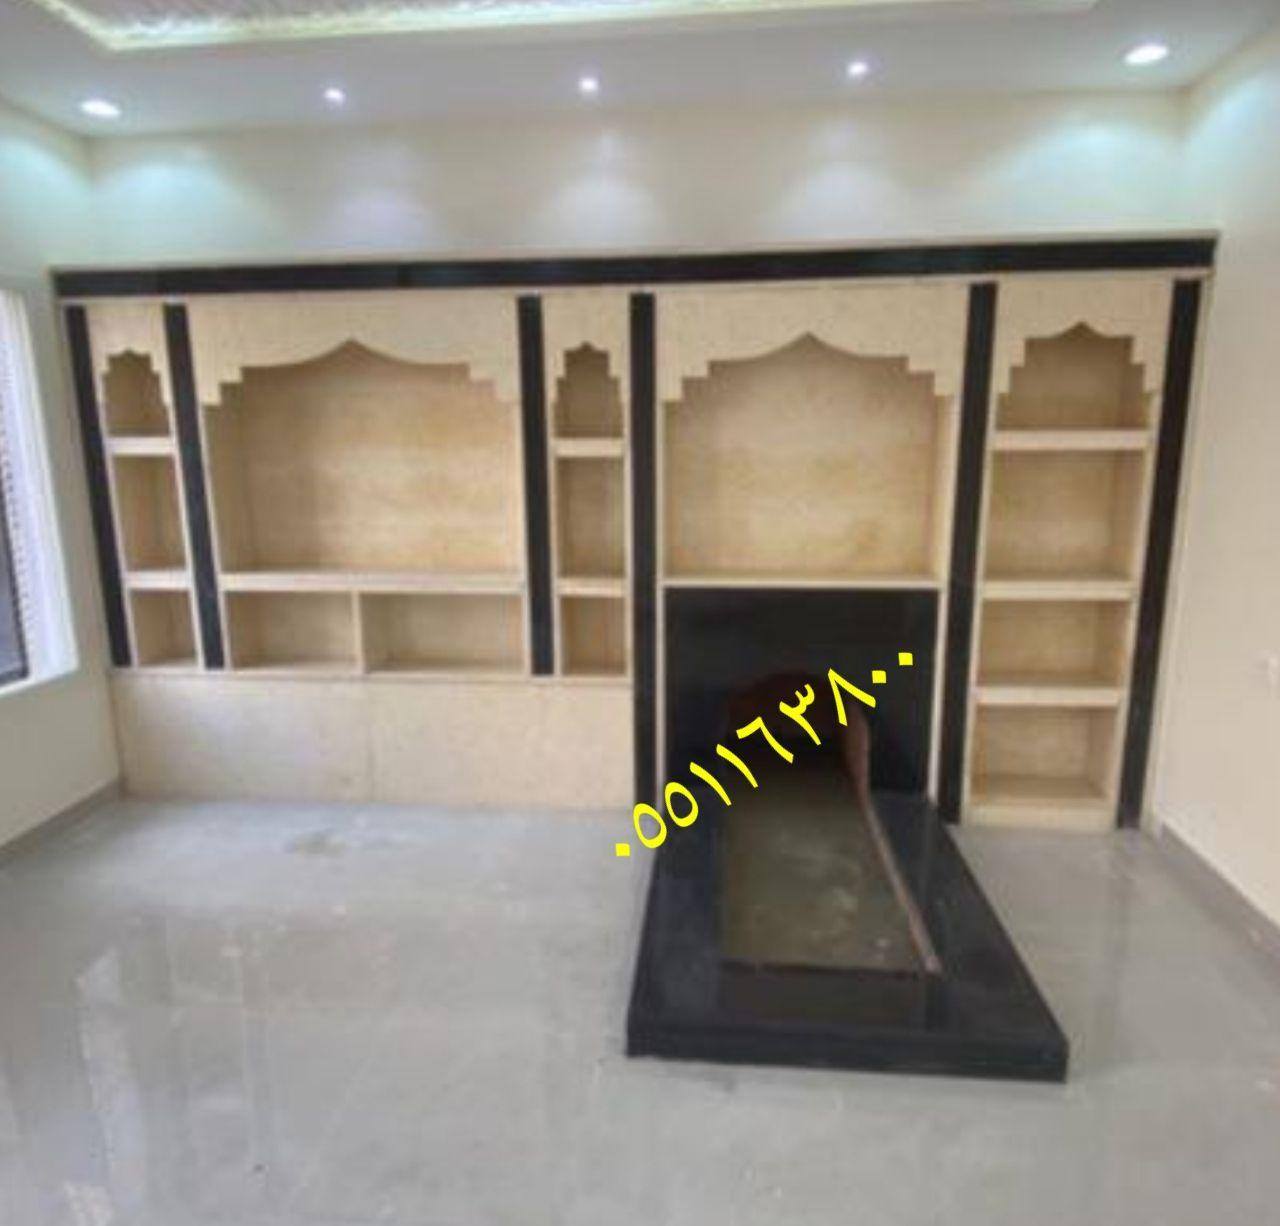 مشبات رخام عماني نخب اول مشبات رخام طاولات مشبات رخام طاولة مشبات رخام طبيعي Entryway Tables Home Decor Furniture